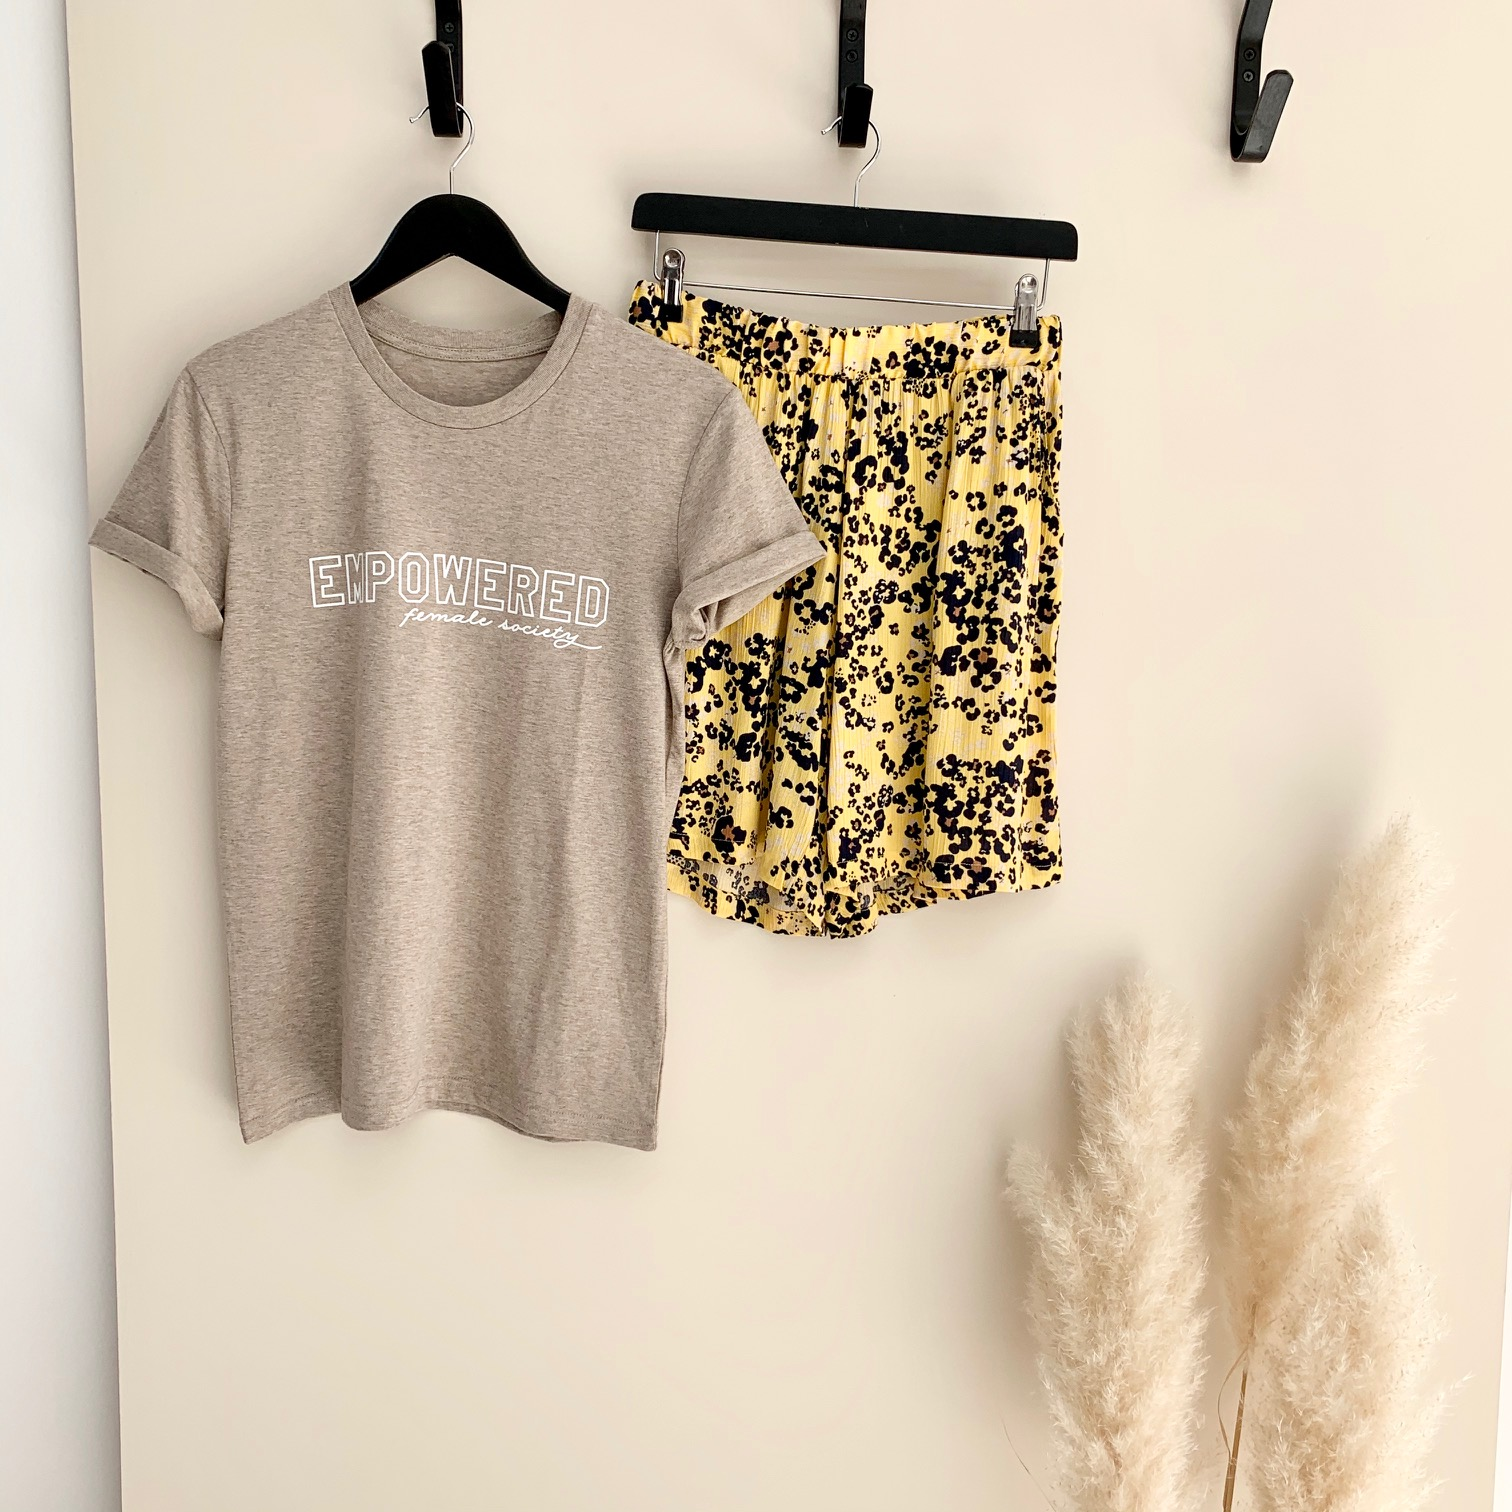 Empowered female society T-shirt Stone